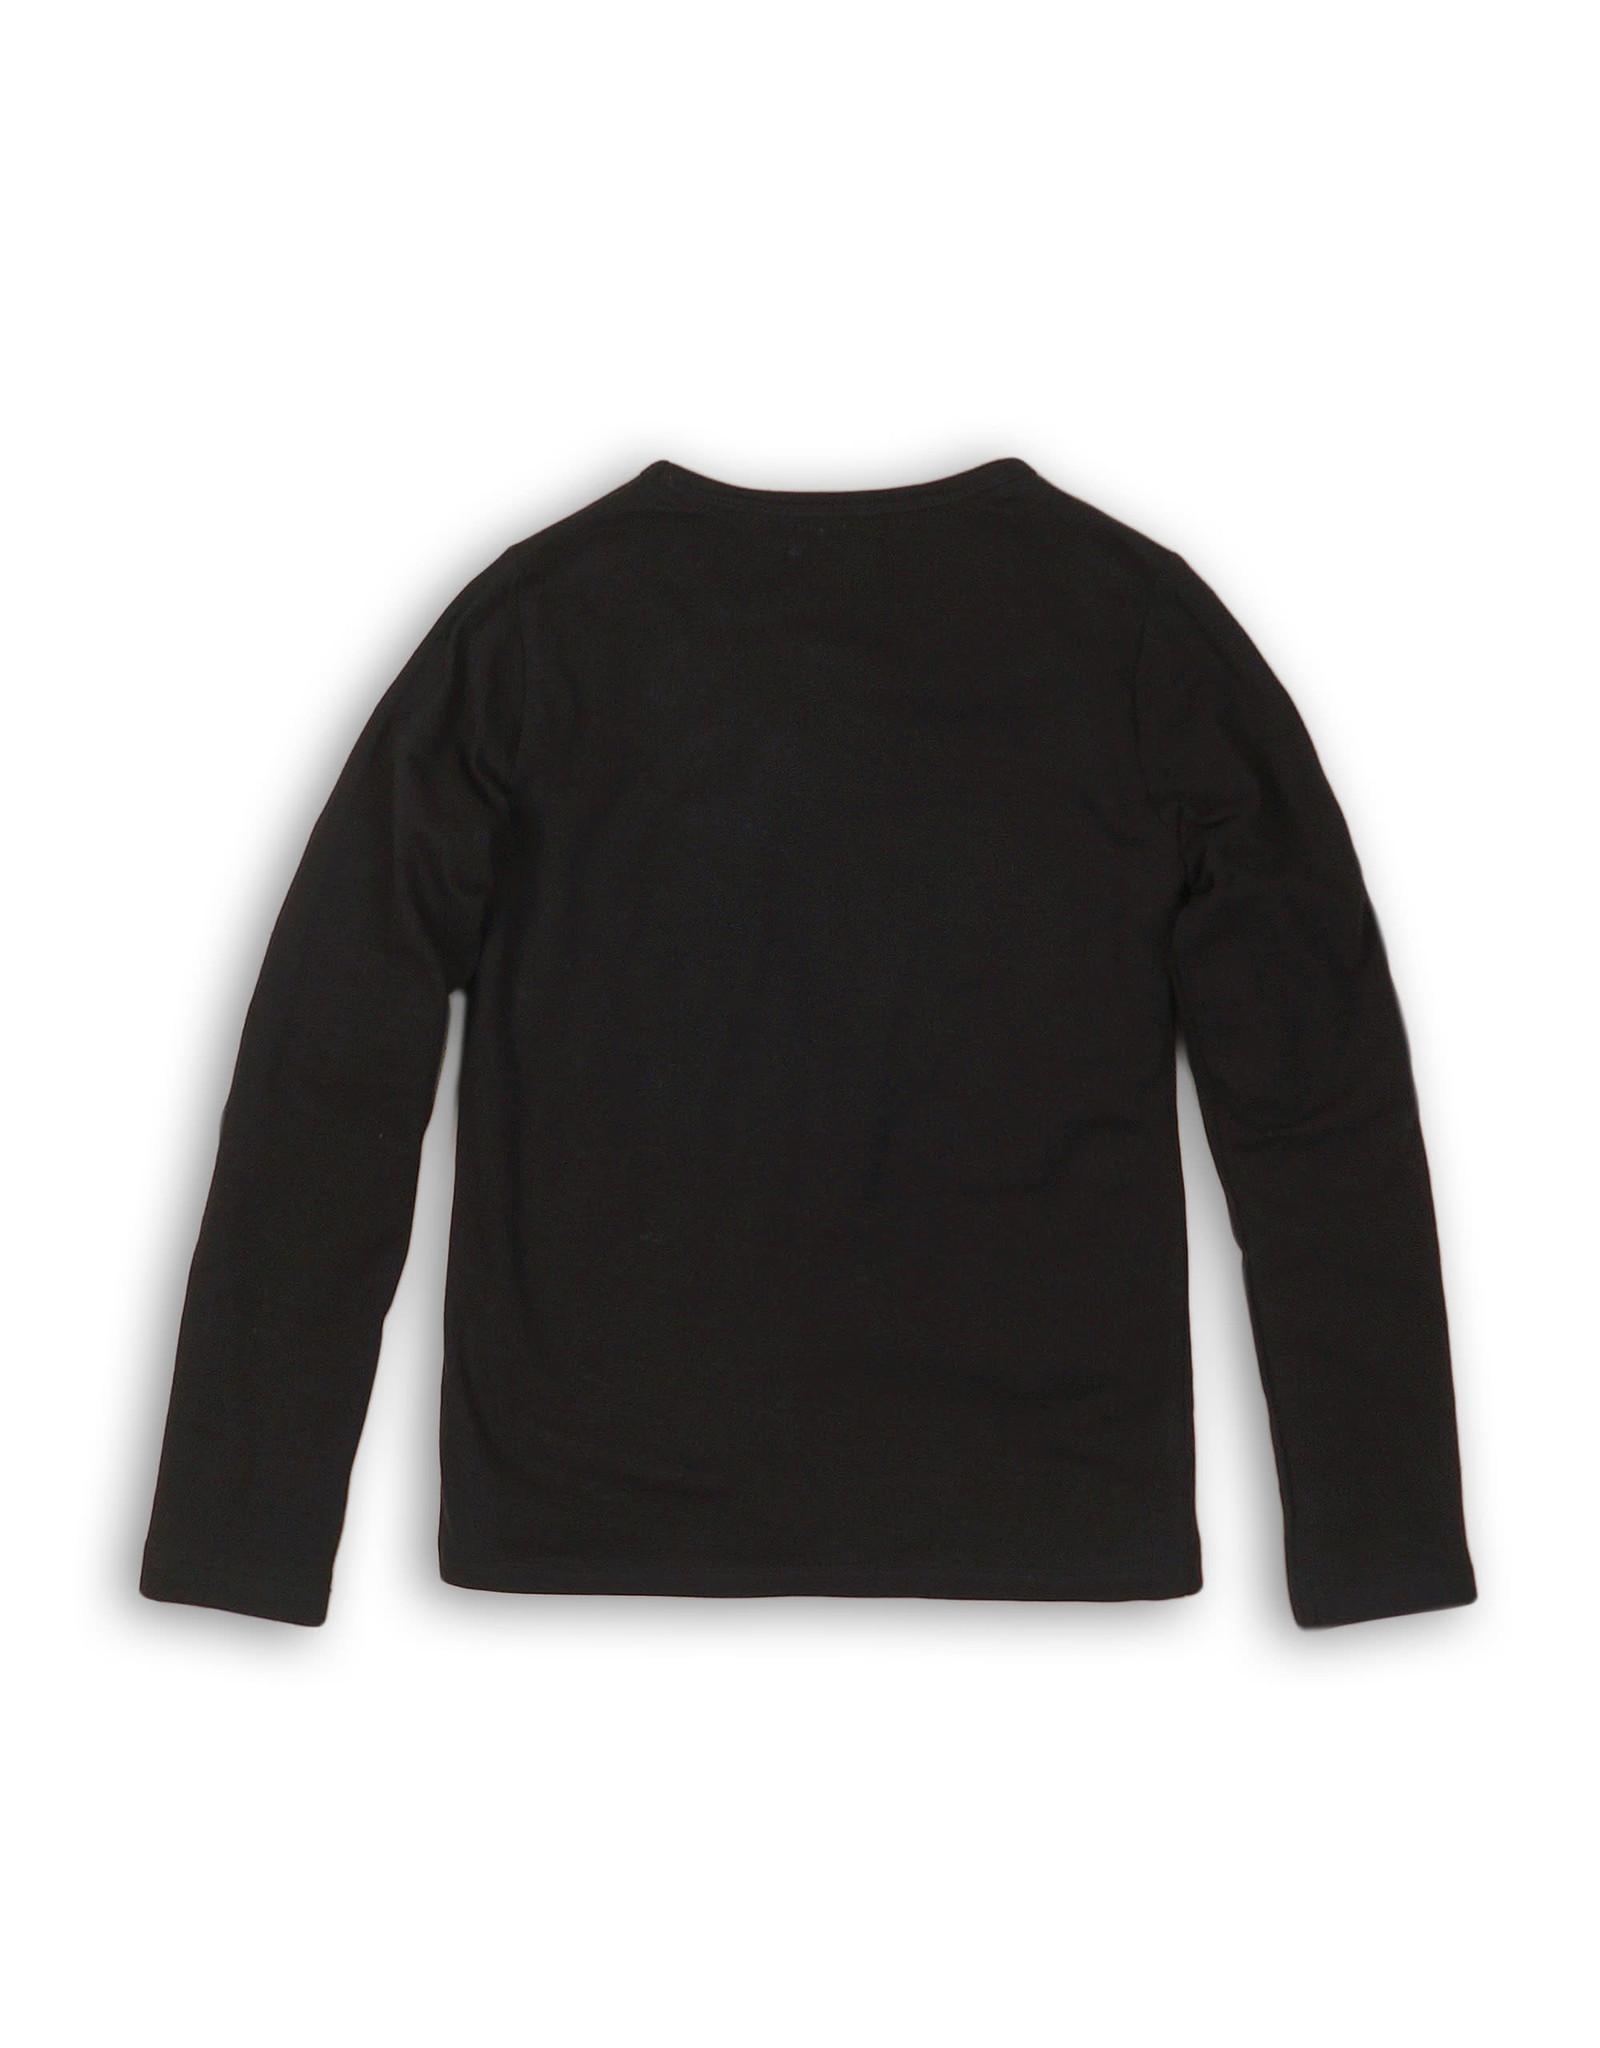 DJ Dutchjeans DJ Dutchjeans meiden shirt BORN TO BE A UNICORN